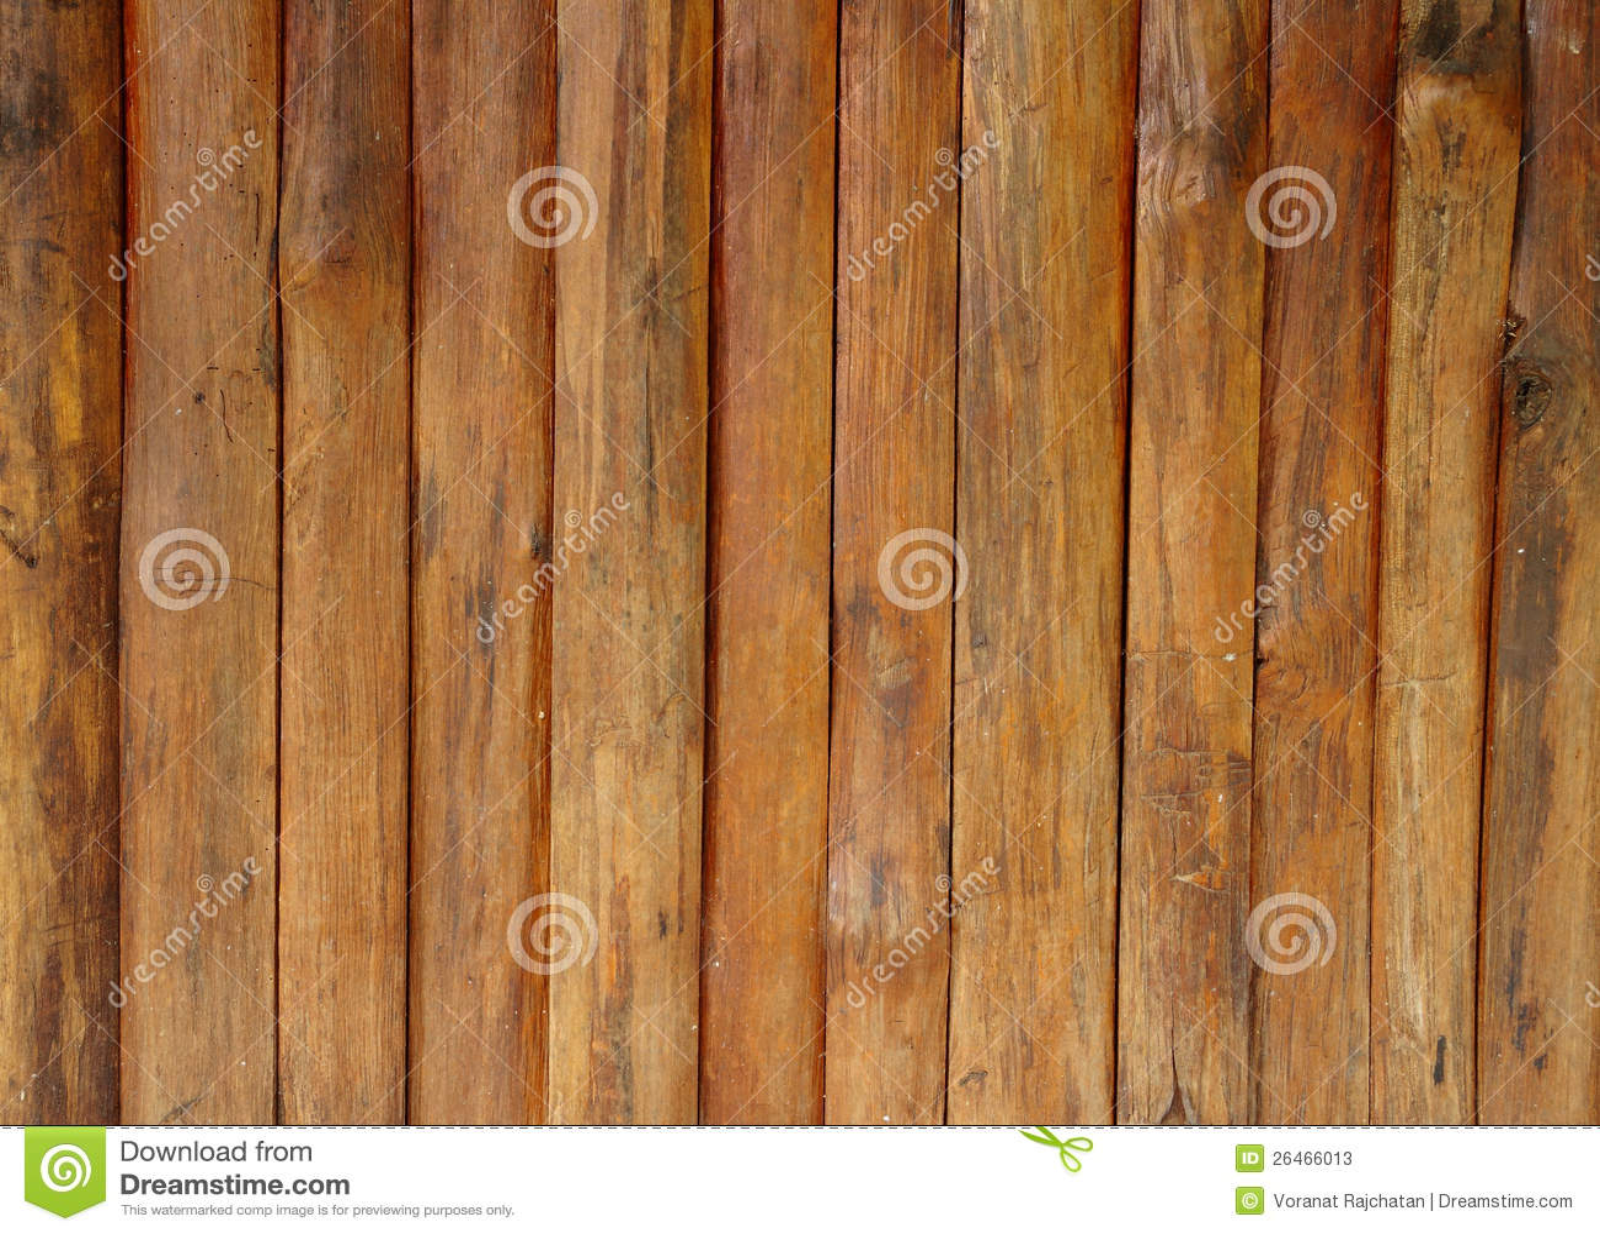 Rough Wood Planks ~ Rough wood plank background stock photos image